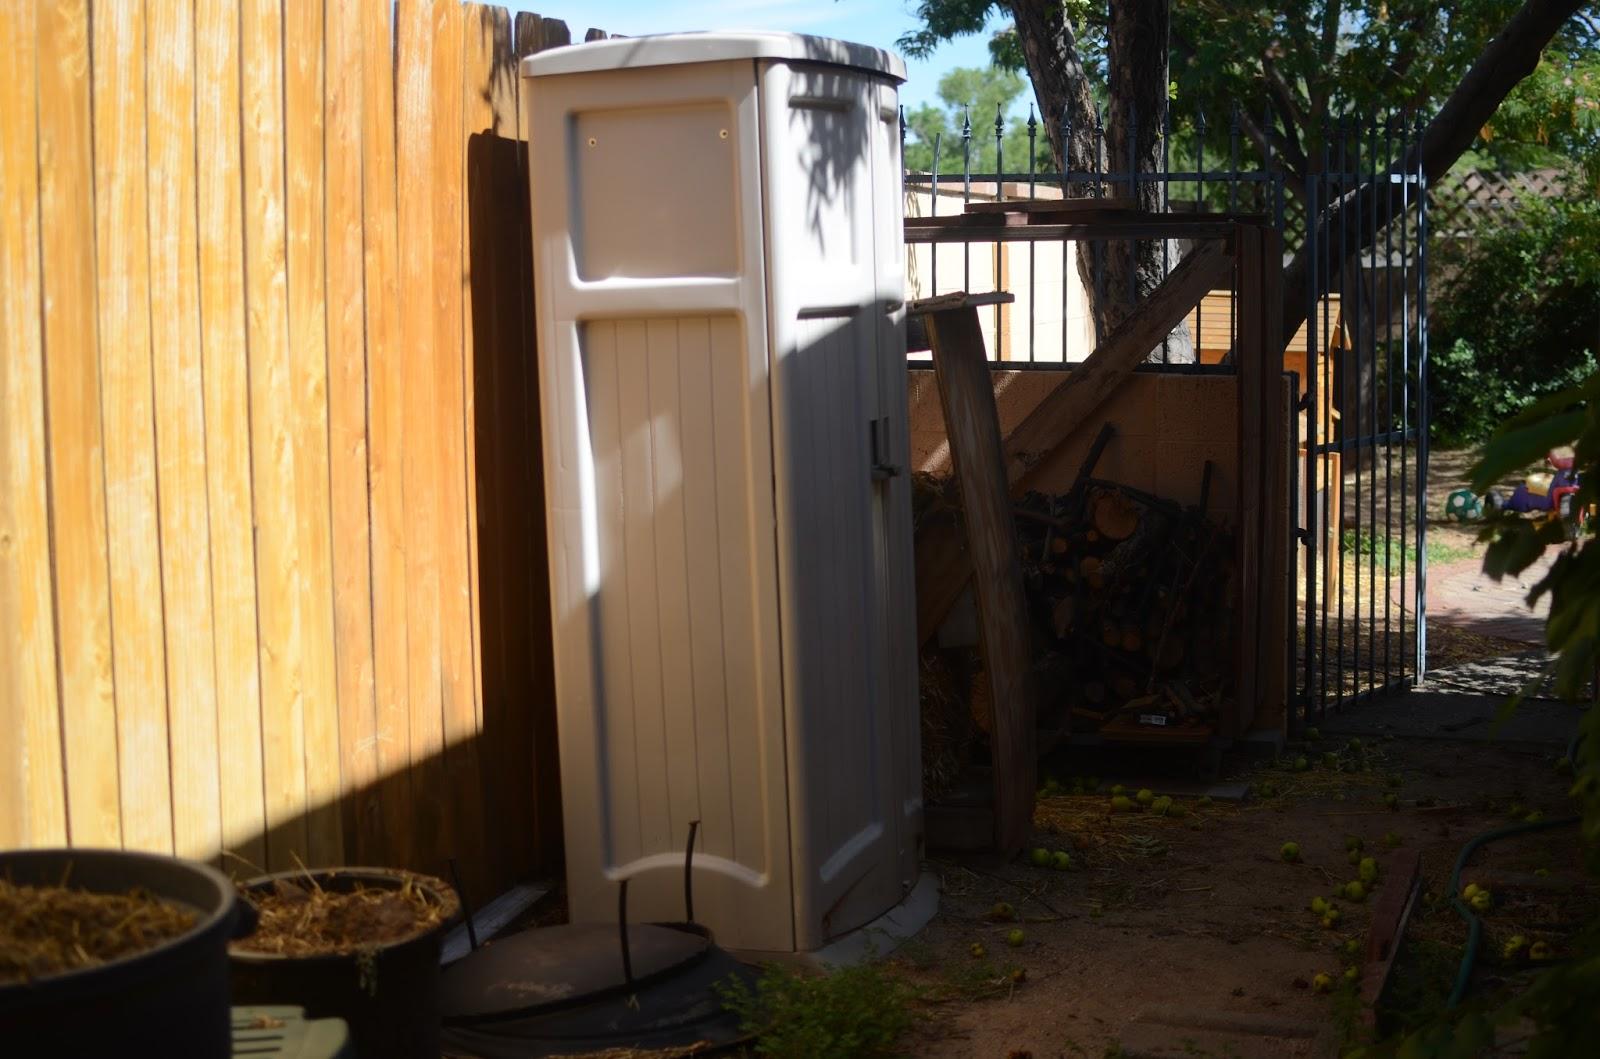 thistlebear storage in a small backyard